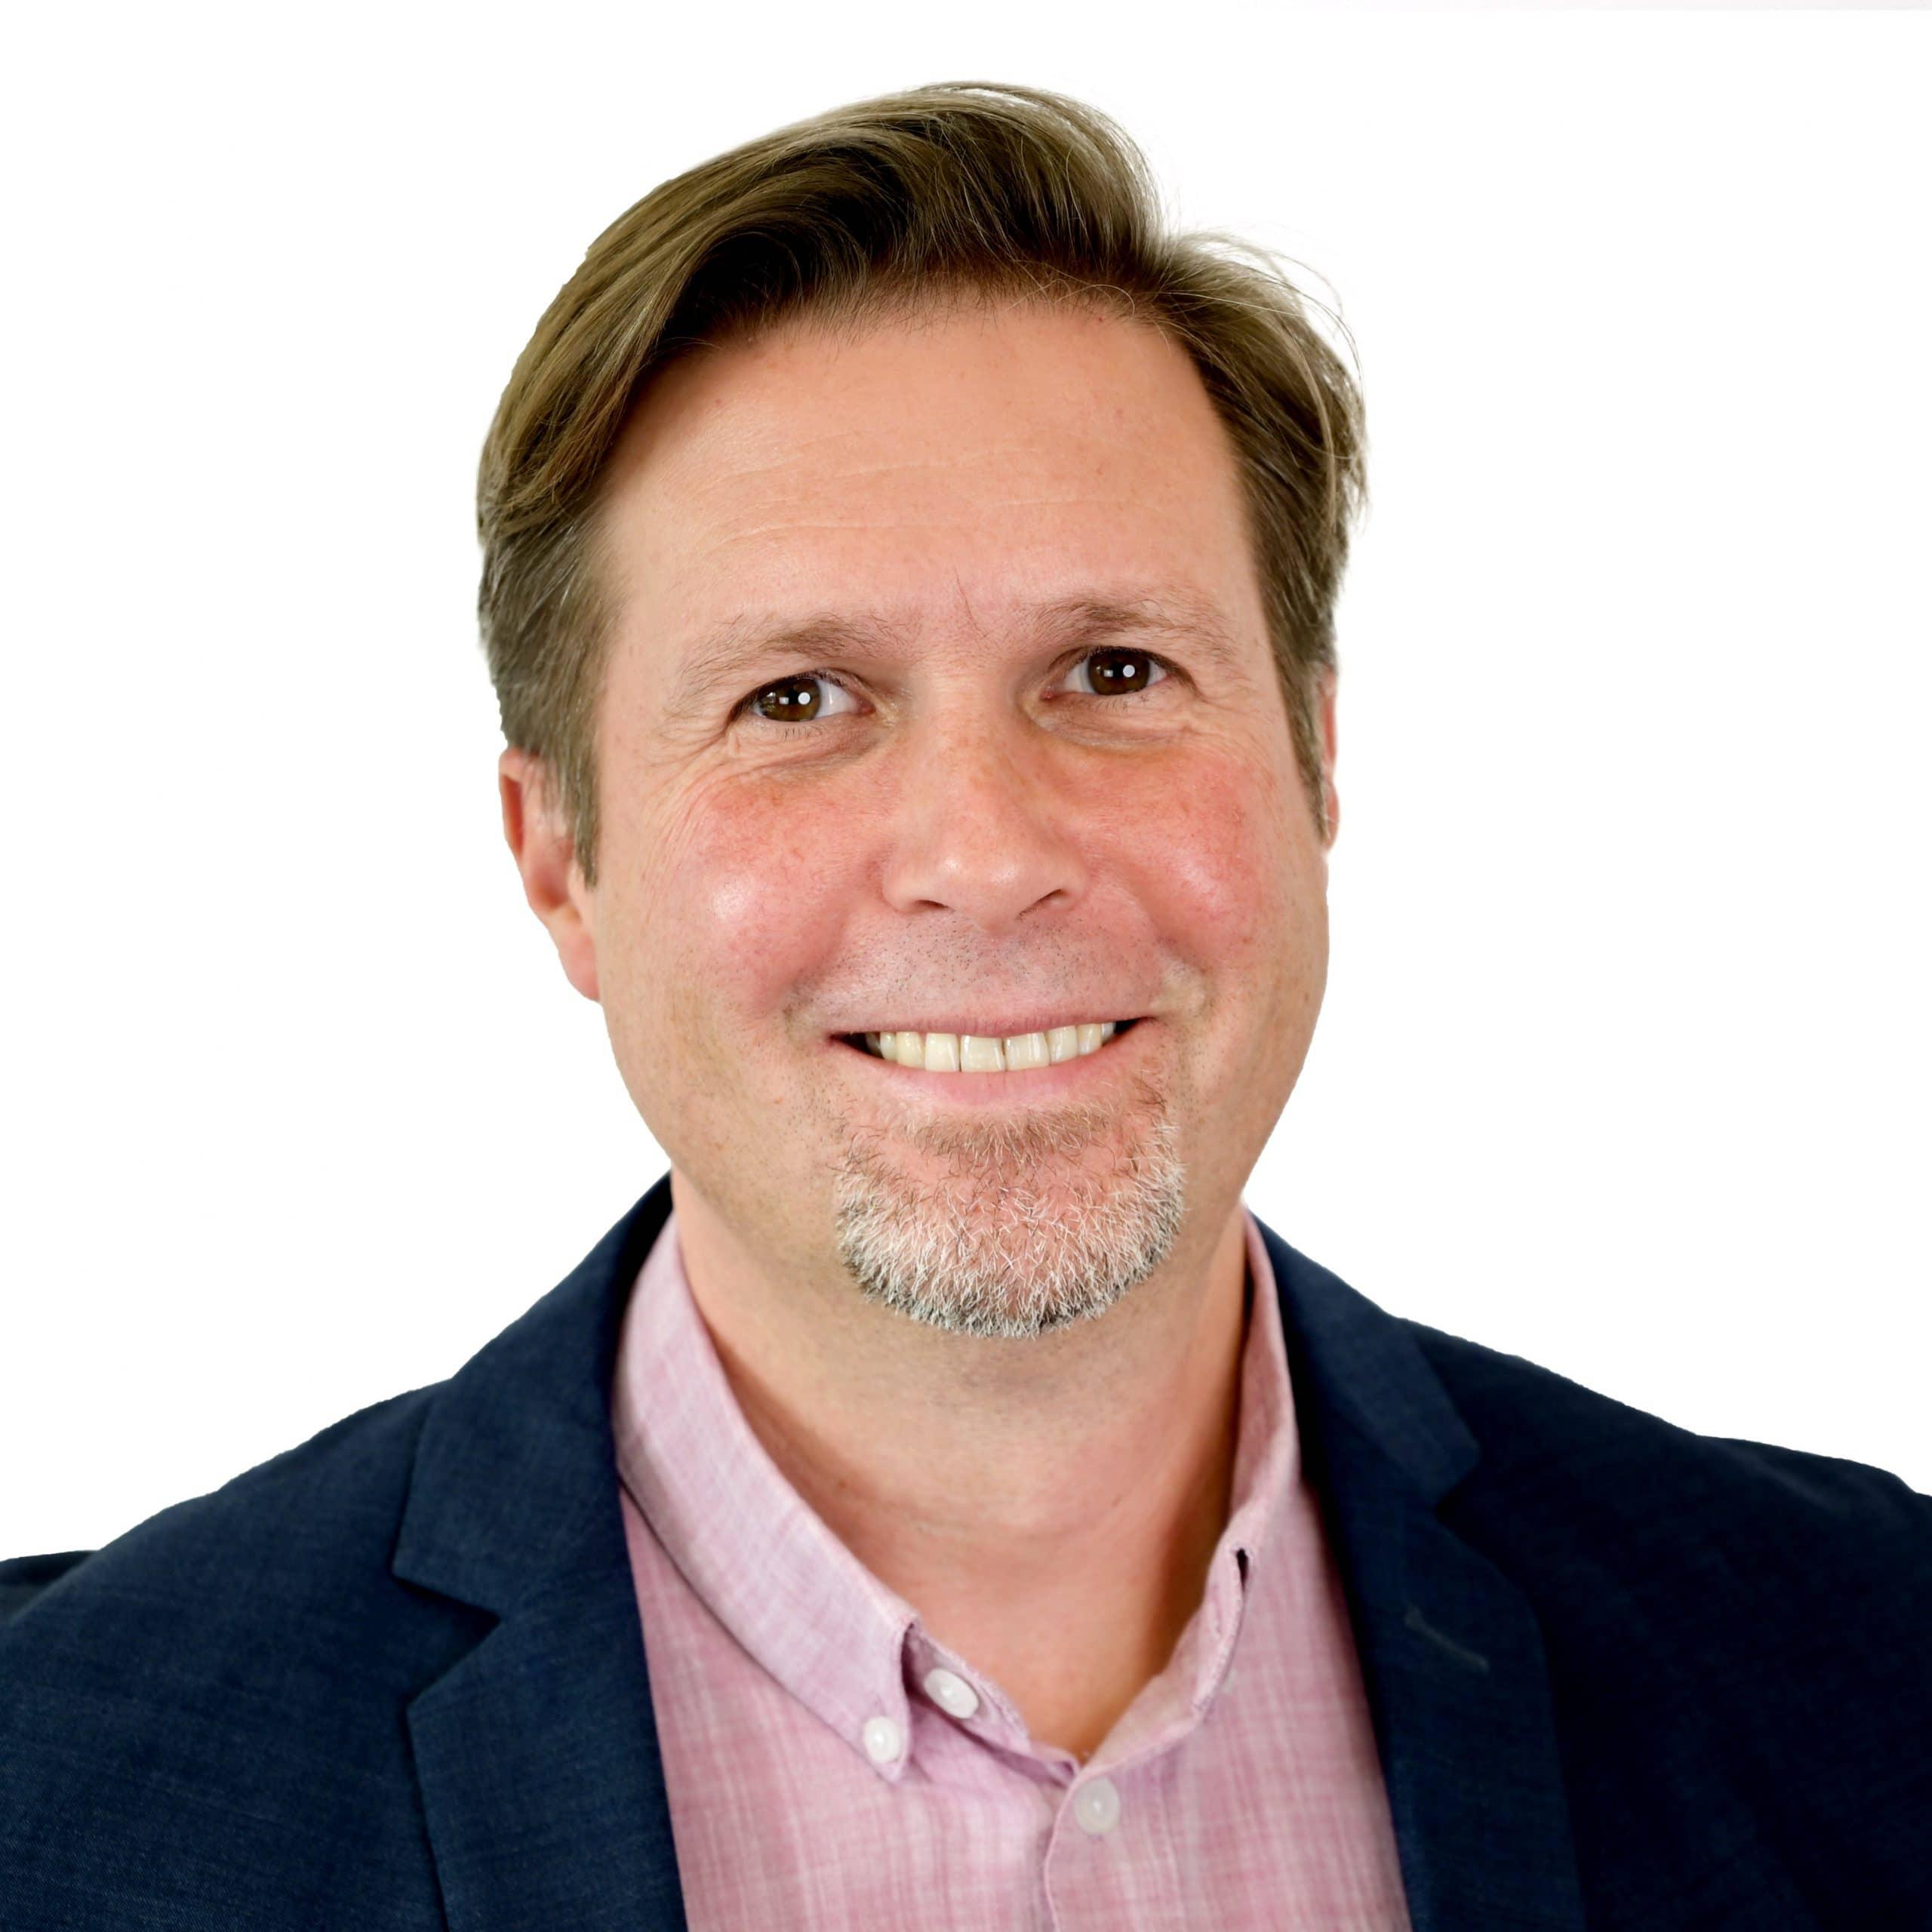 Christian Grossek (Steuerberater & Wirtschaftsprüfer in Graz)